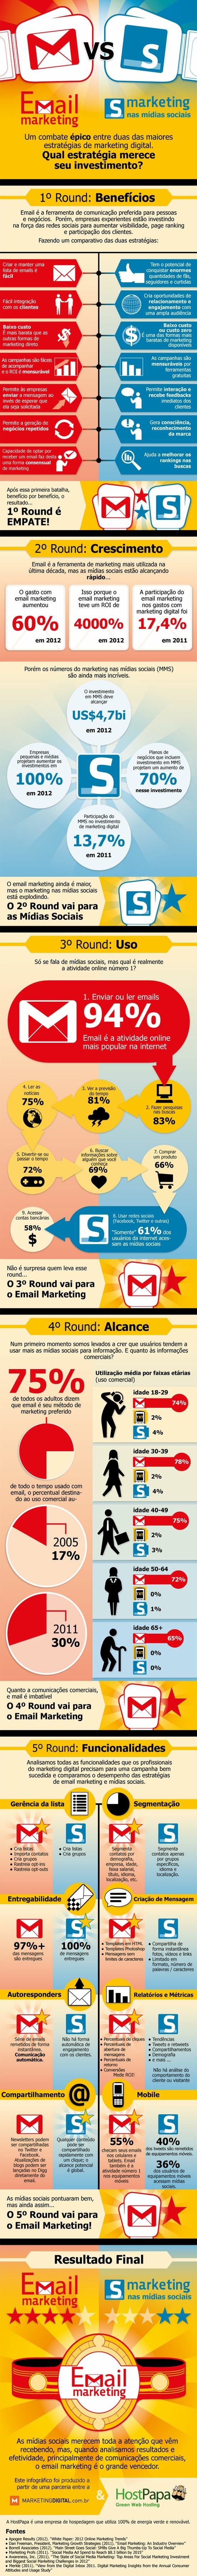 E-mail marketing Vs Social Midia #infografico